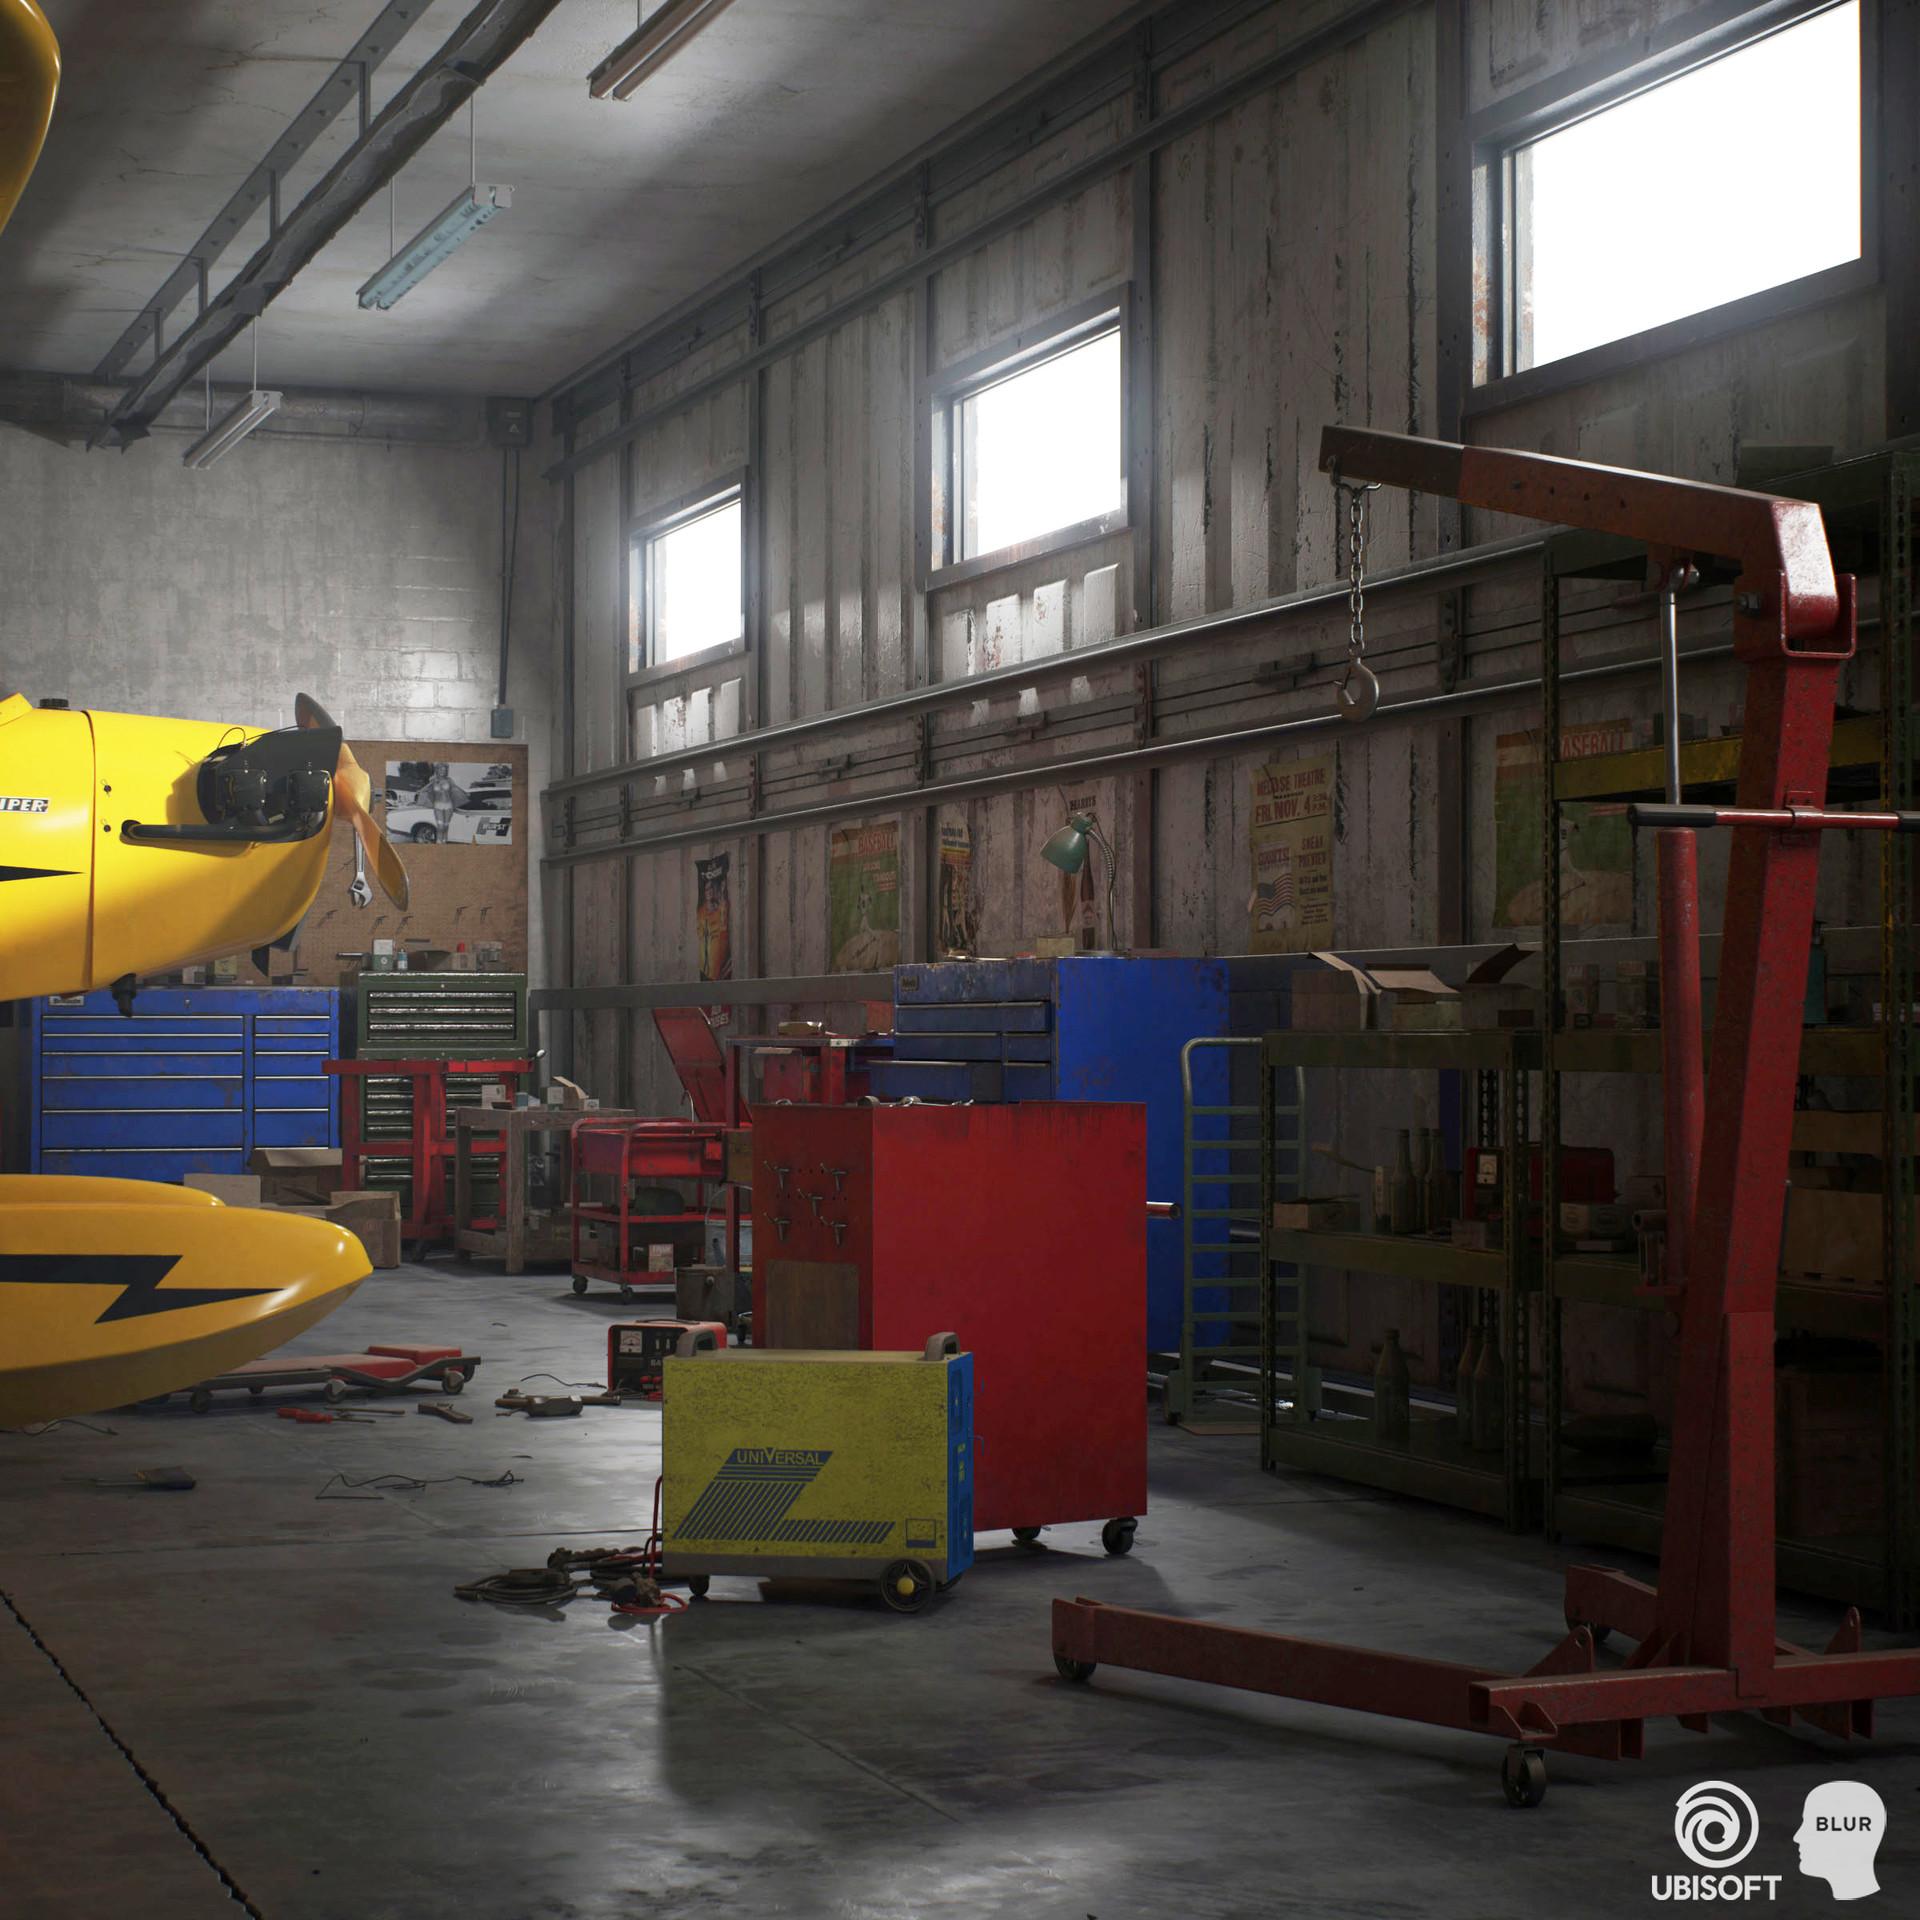 Andrew averkin zeta hangar 02